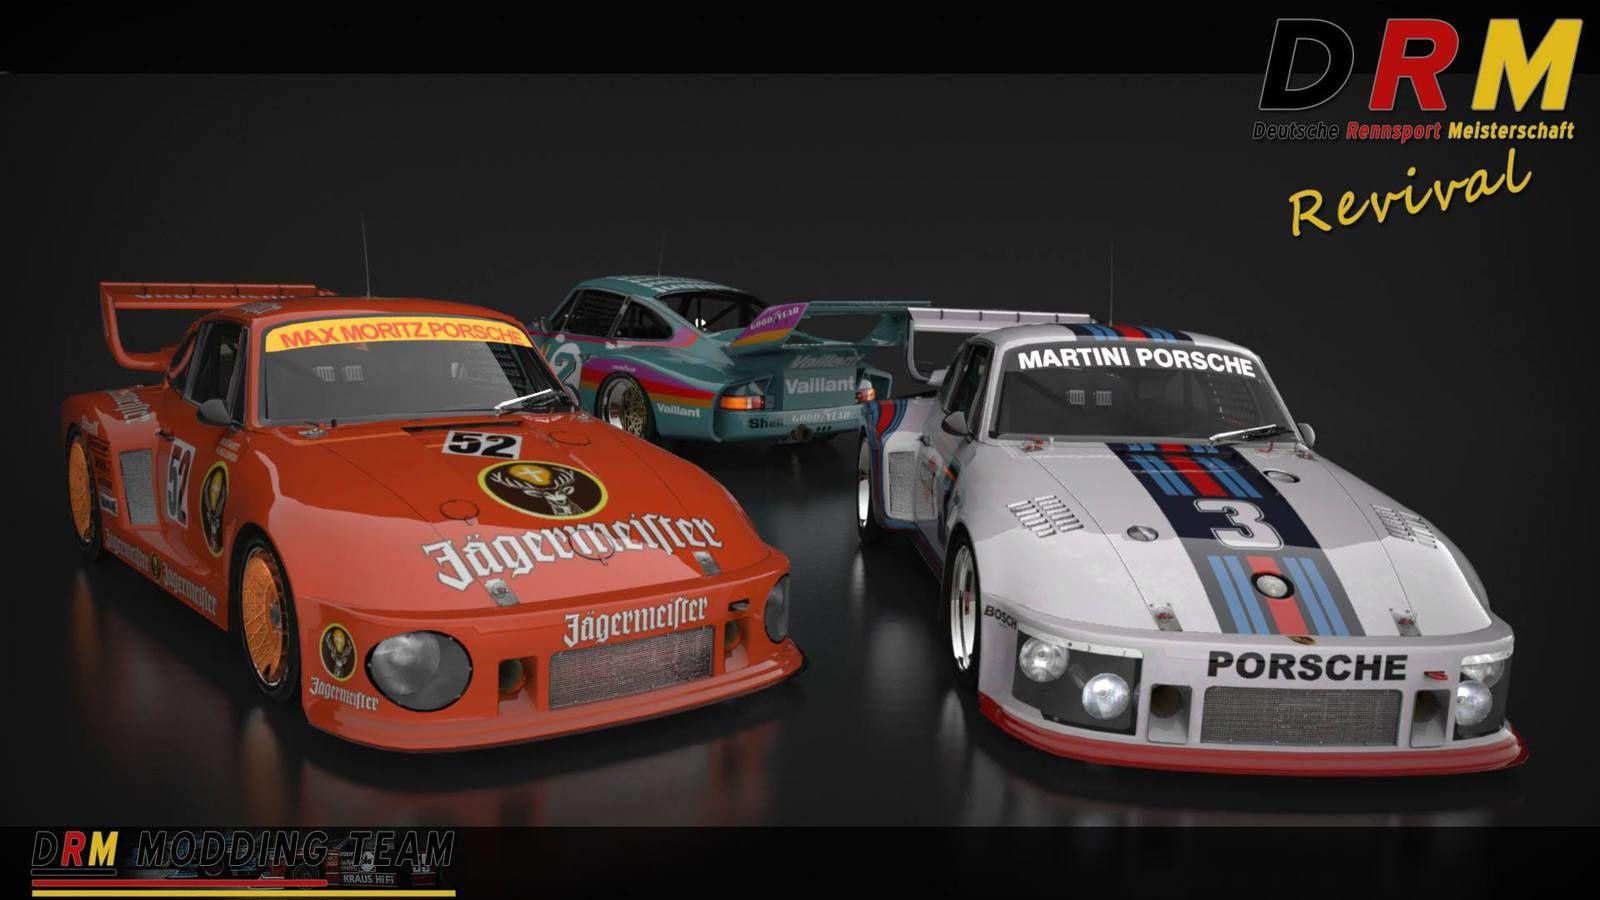 Assetto Corsa – DRM Revival Mod